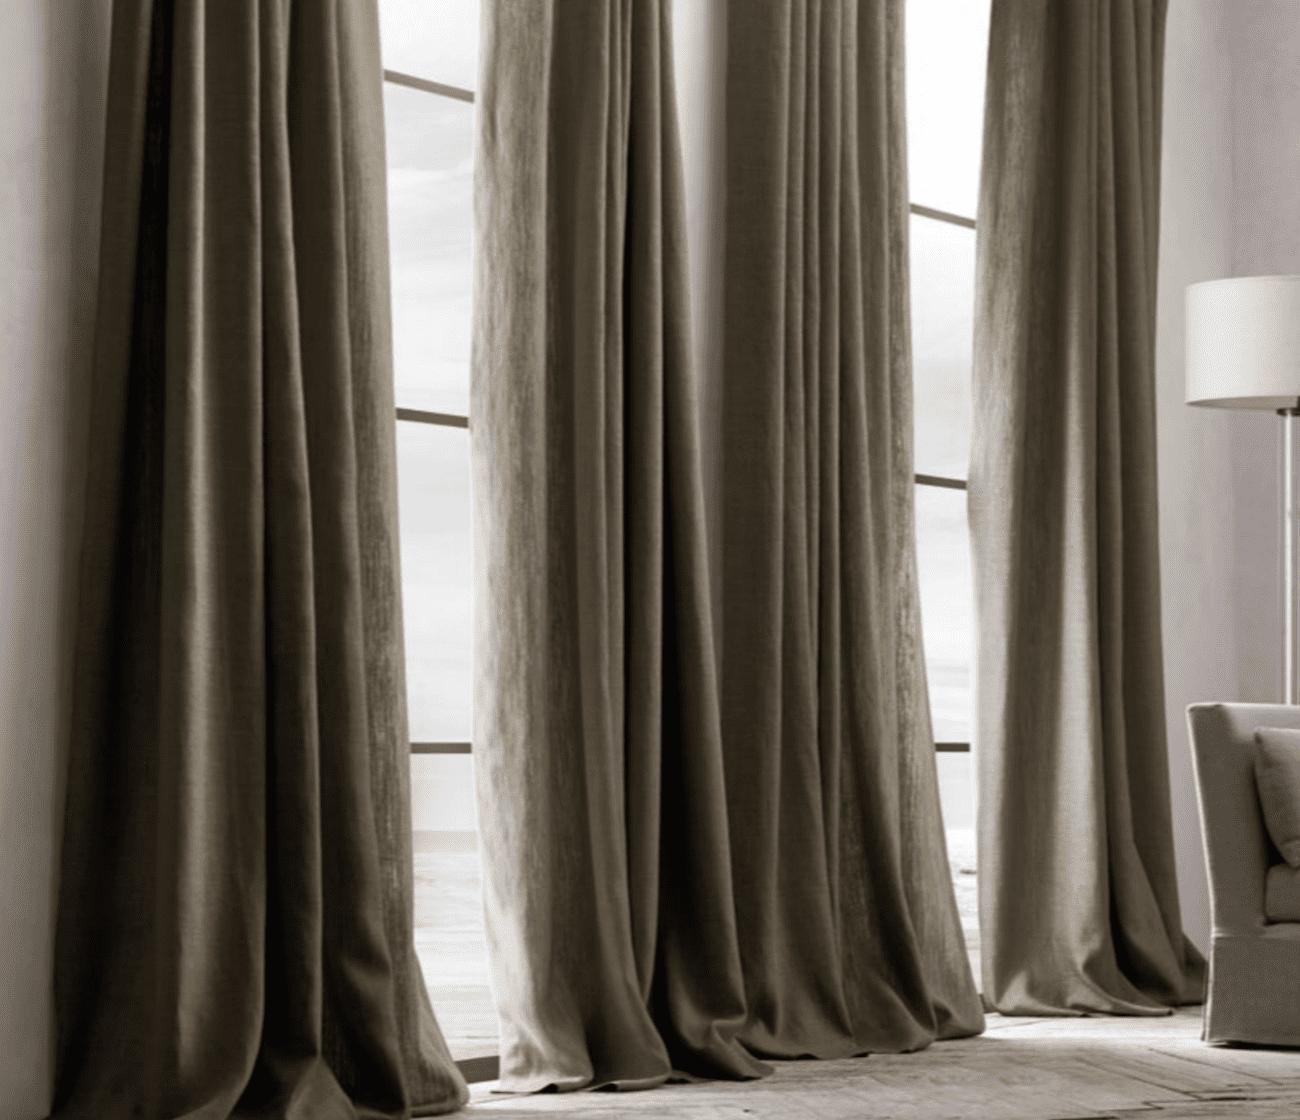 Charcoal linen drapes